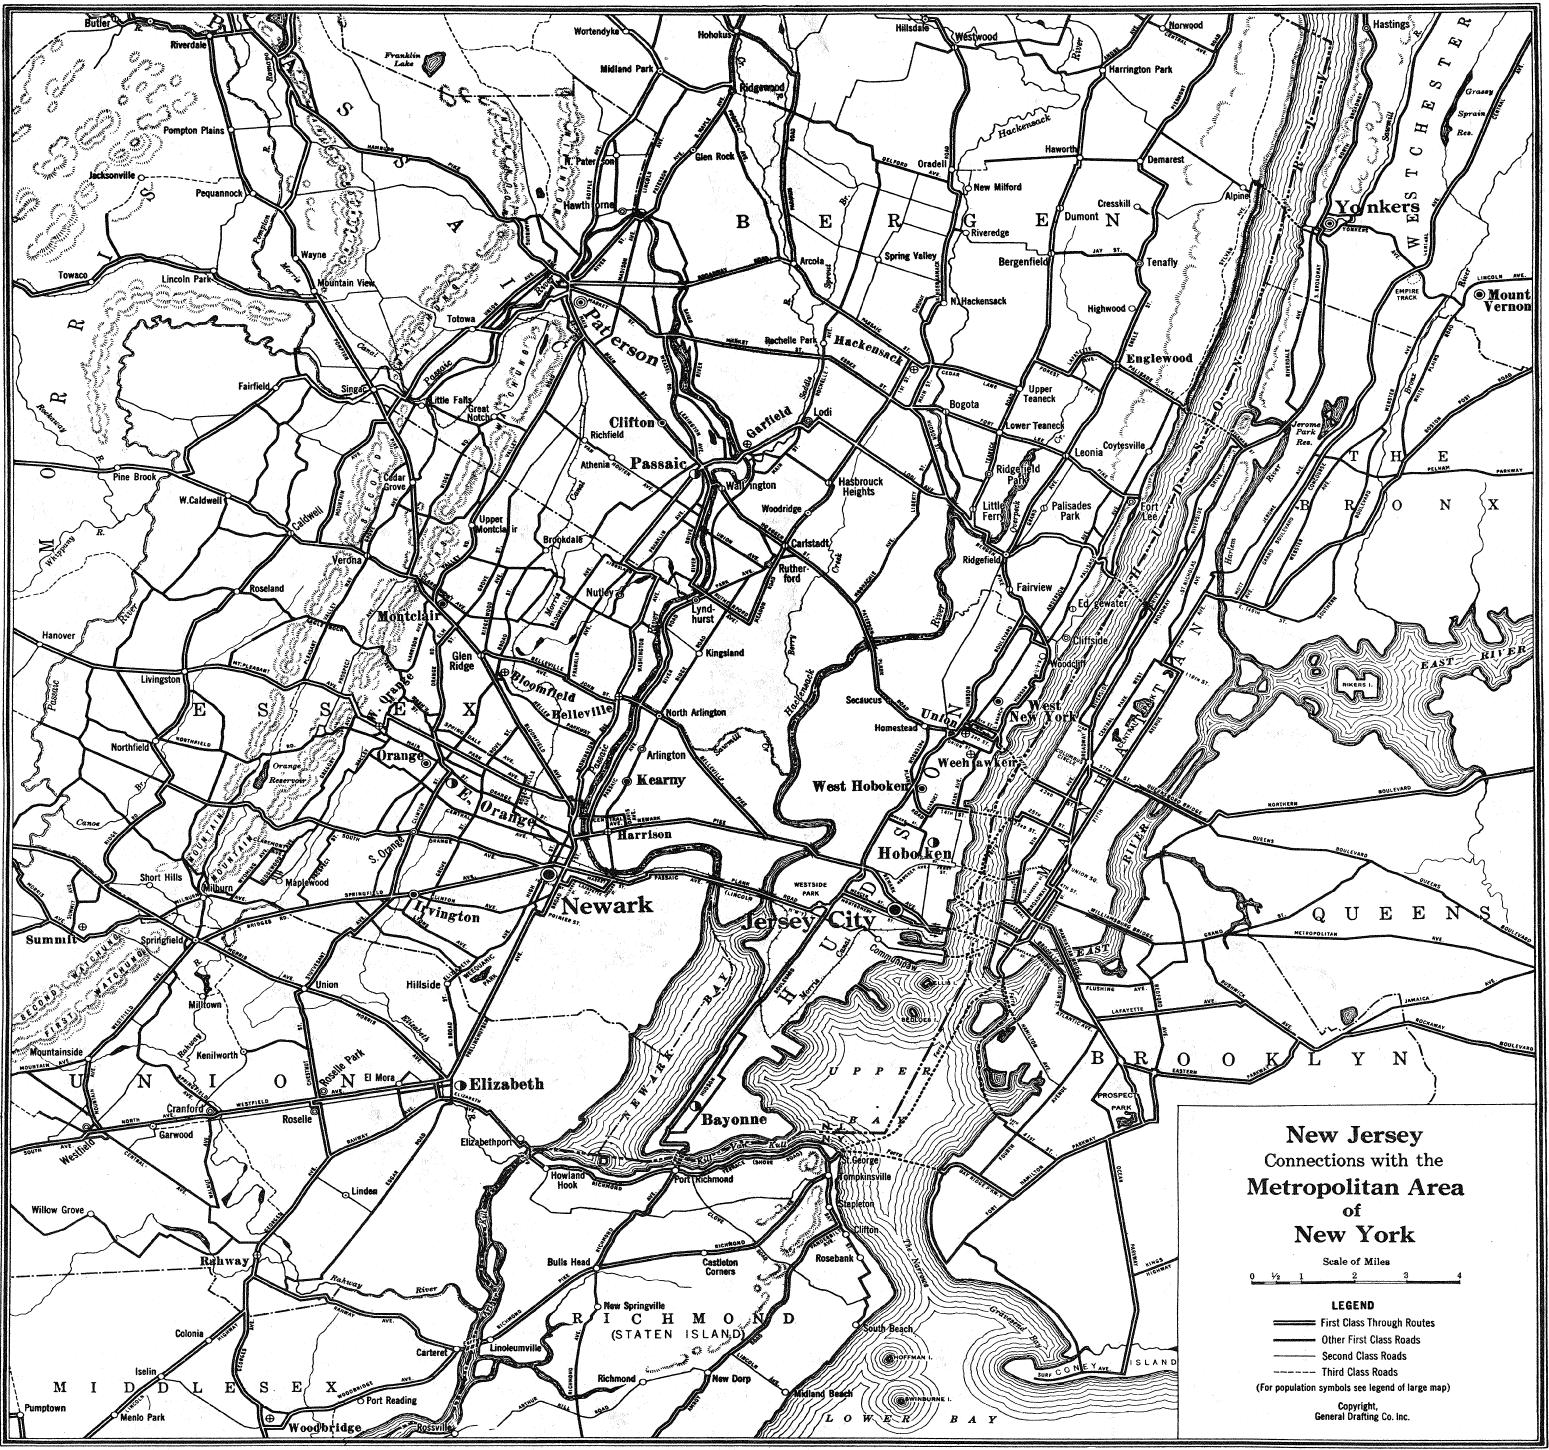 1549x1450 Drawing Road Maps Does Baking Soda And Vinegar Unclog Drains Diagram